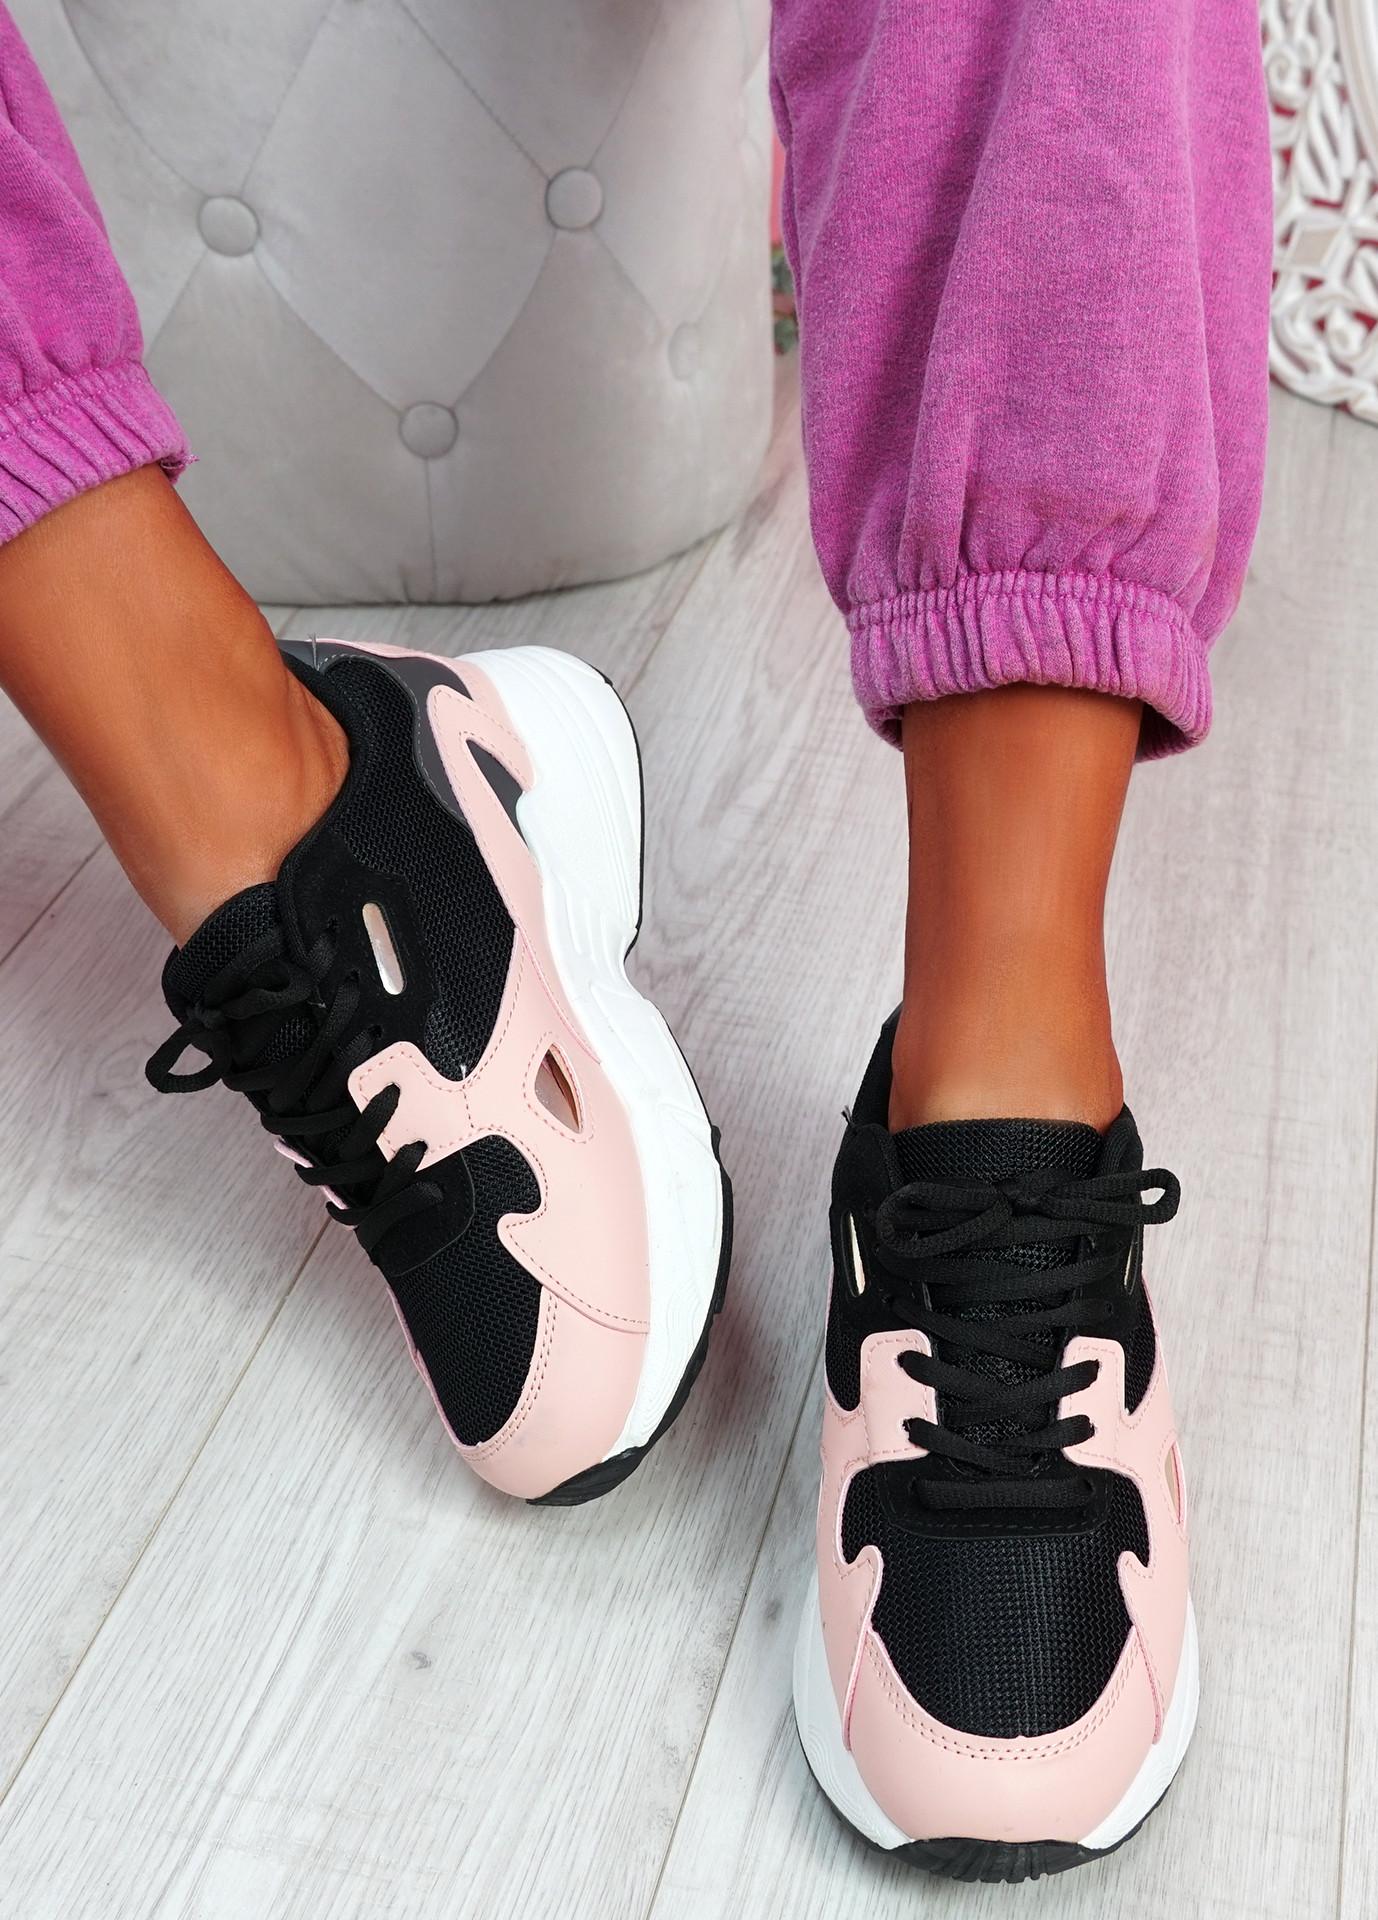 Yusa Black Pink Chunky Sneakers